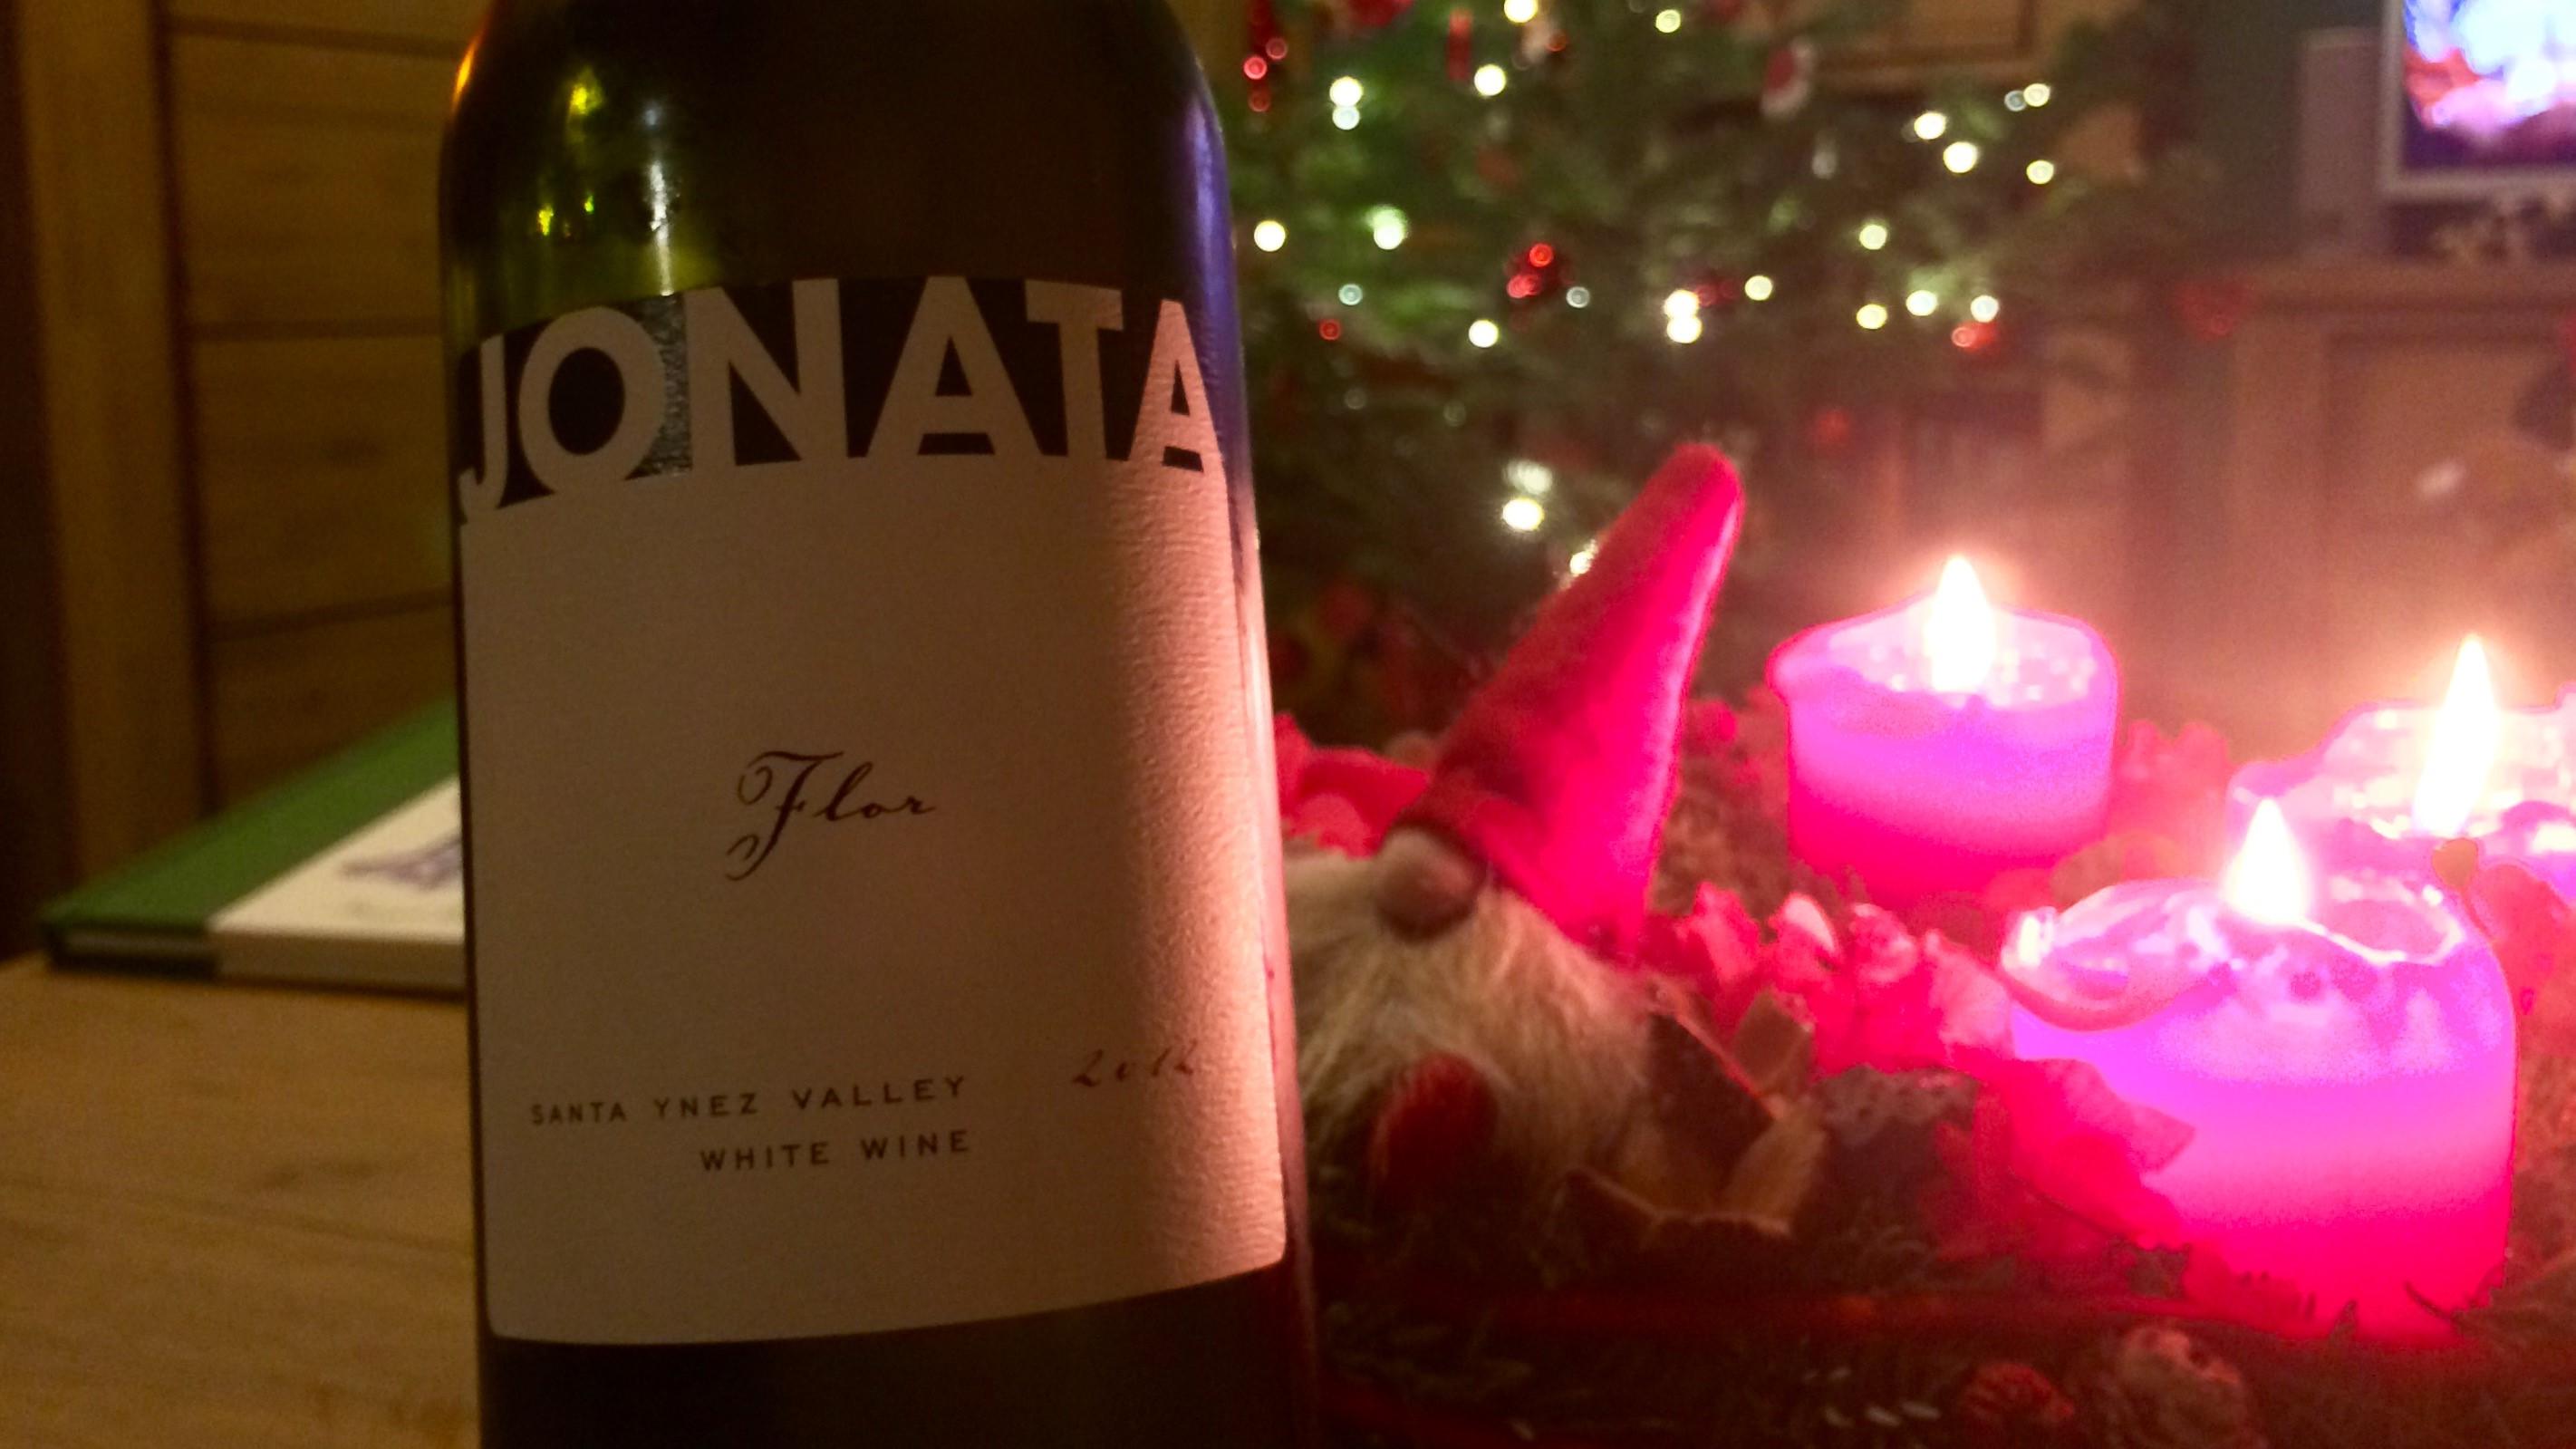 2012 Flor, Jonata